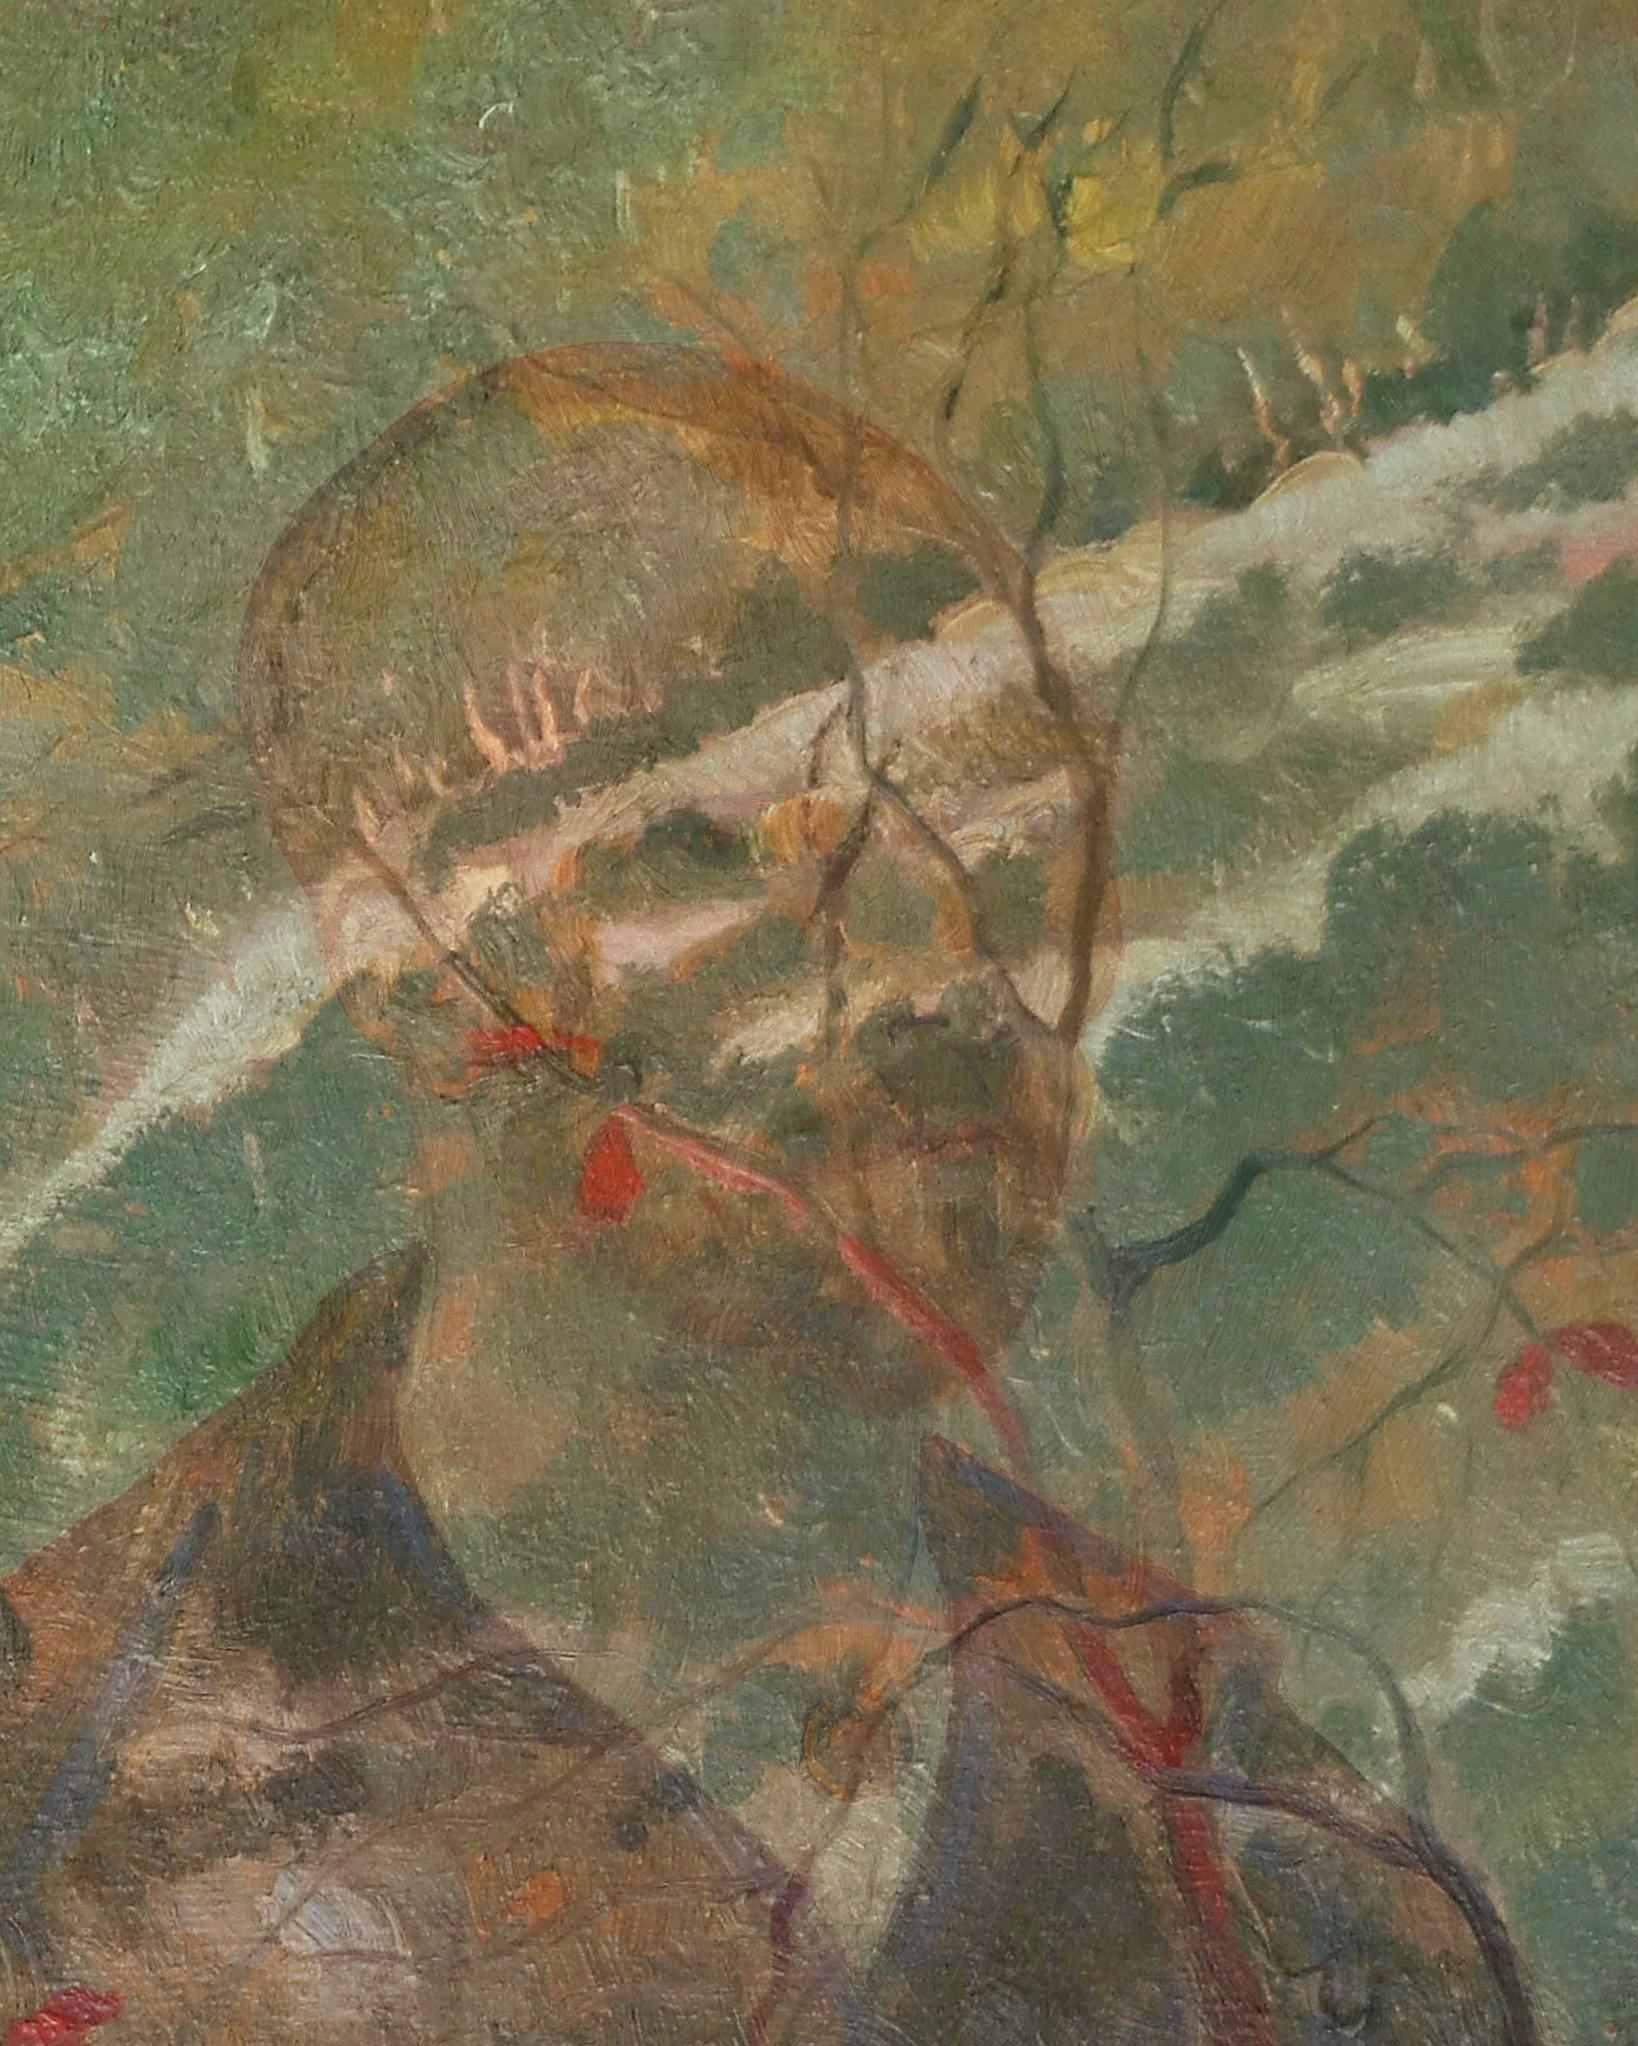 Detail, Van Gogh, overlap, Landscape Provence - Van Gogh, Self-portrait